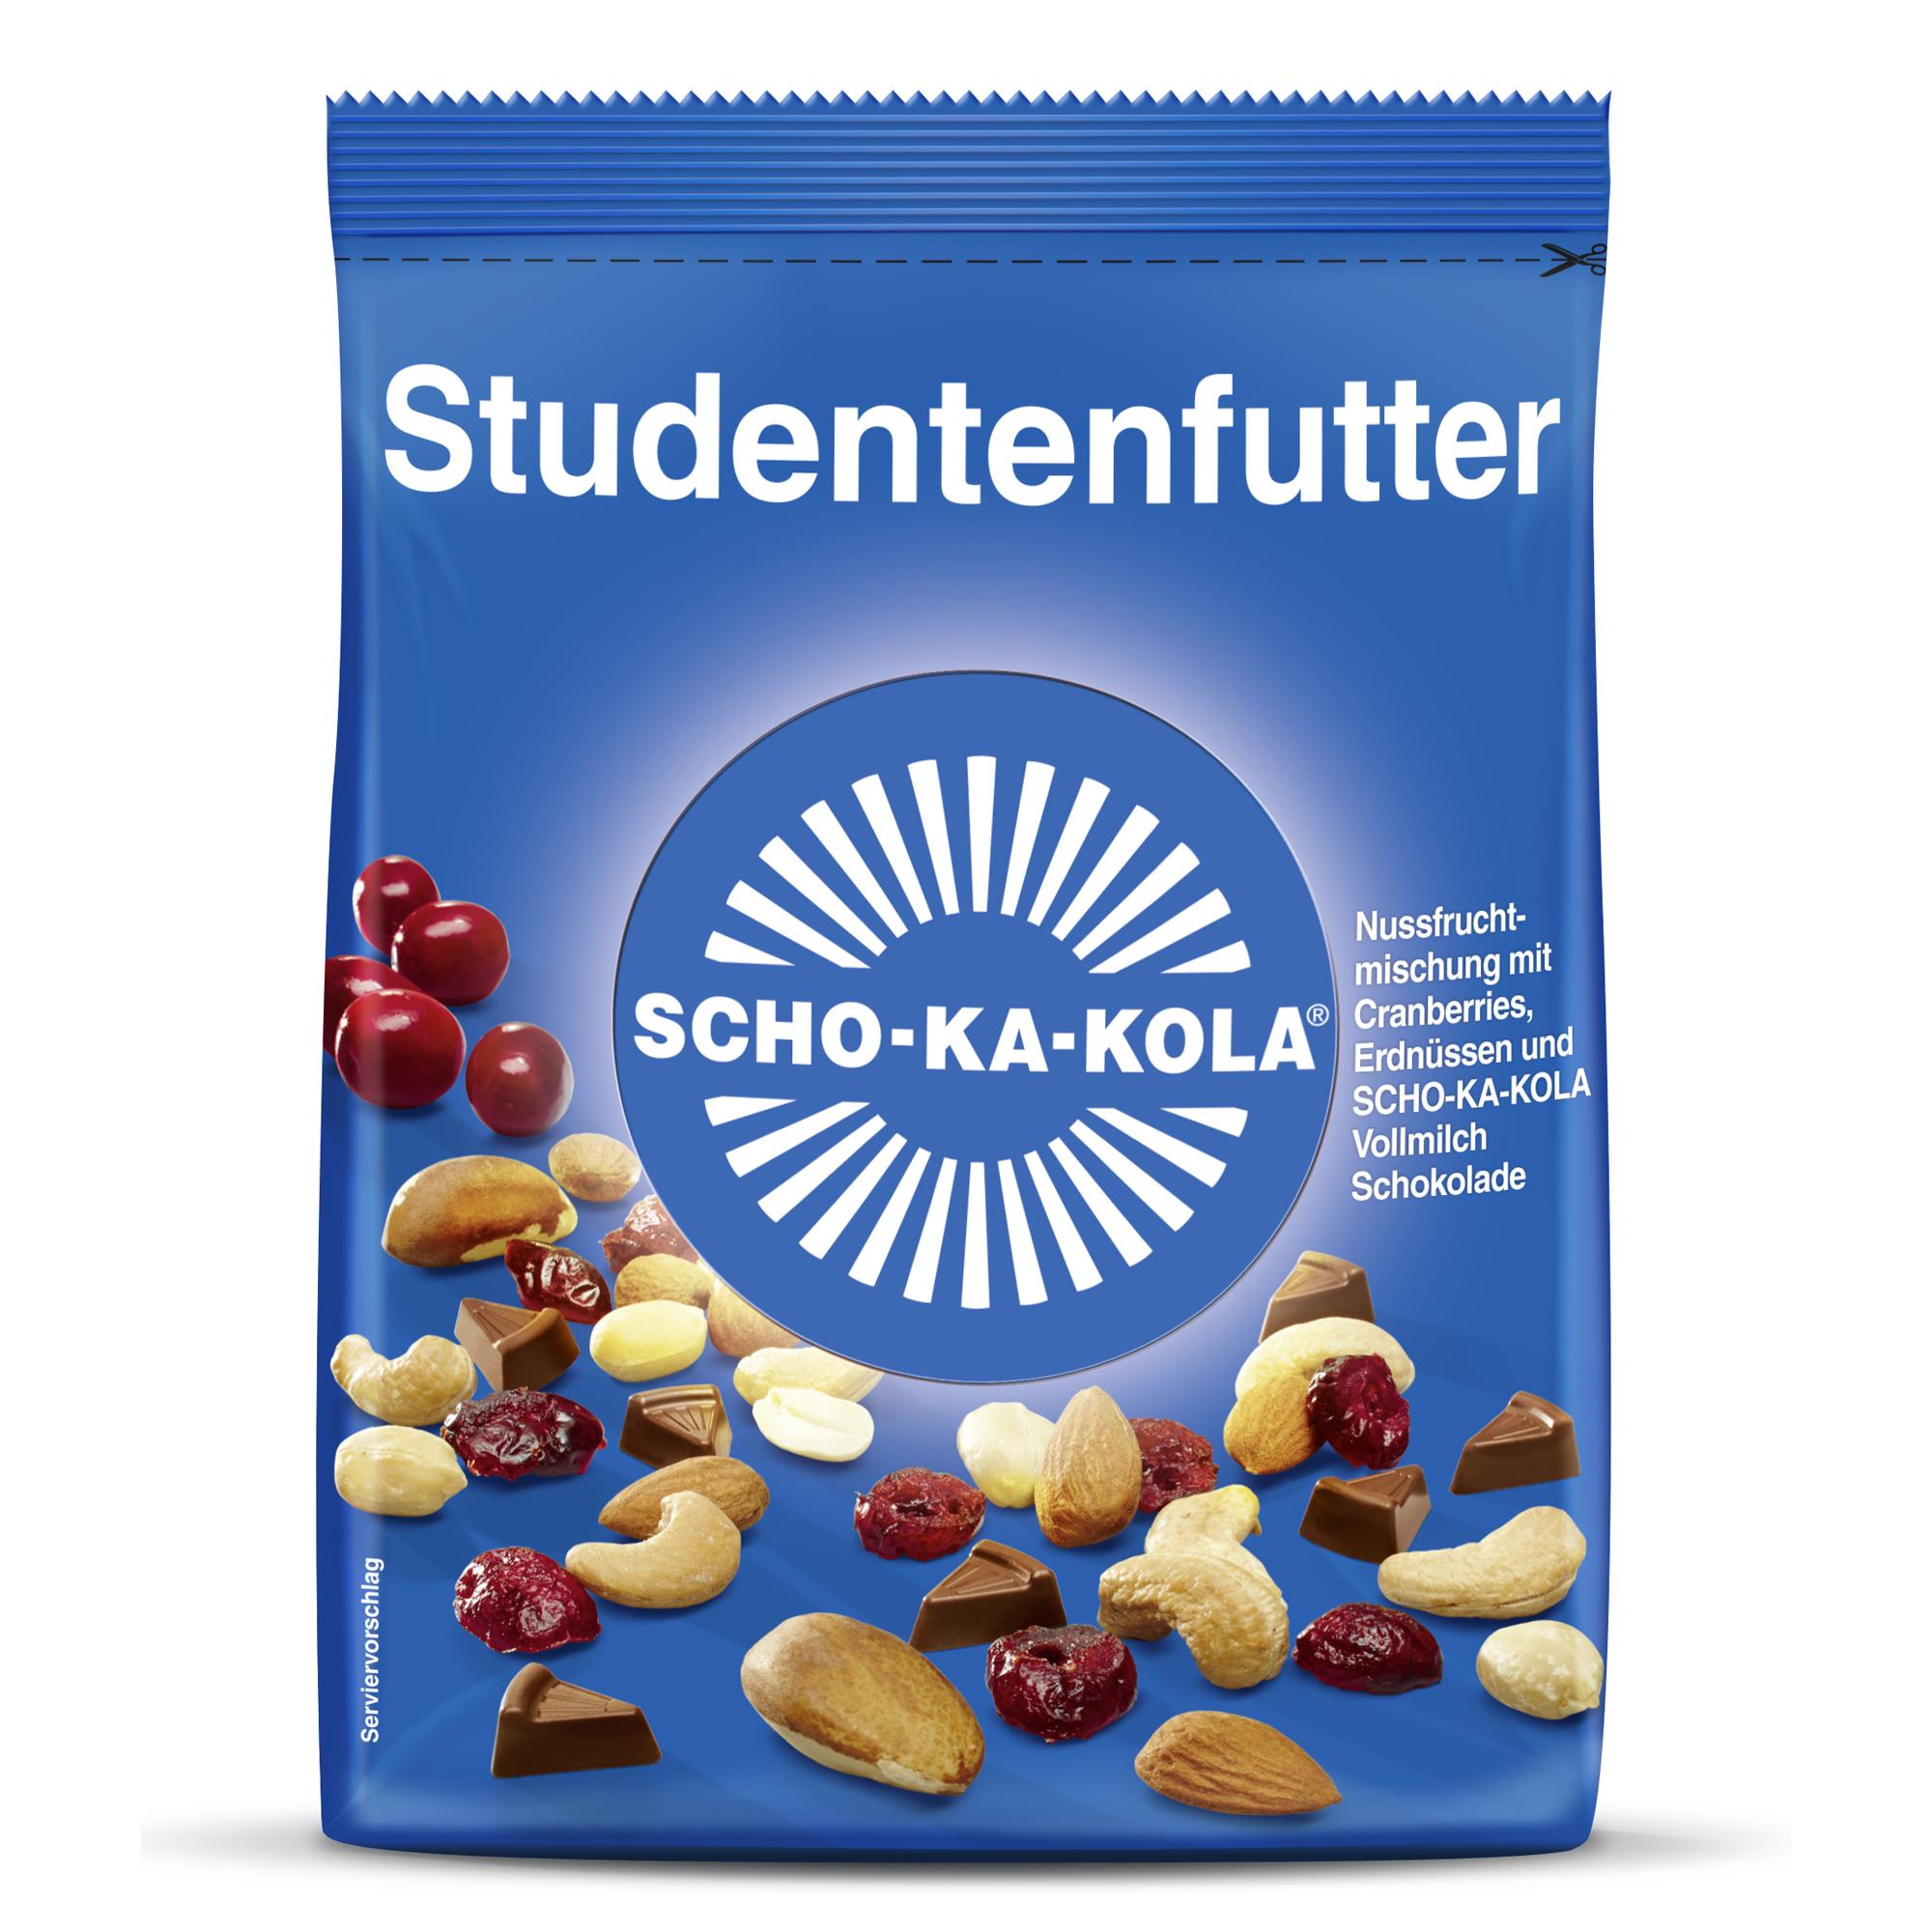 ... Edle Vollmilch Schokolade Tafel - 100g | online bet at home Treuebonuscode Affiliate bet at home kaufen bei Lieferello